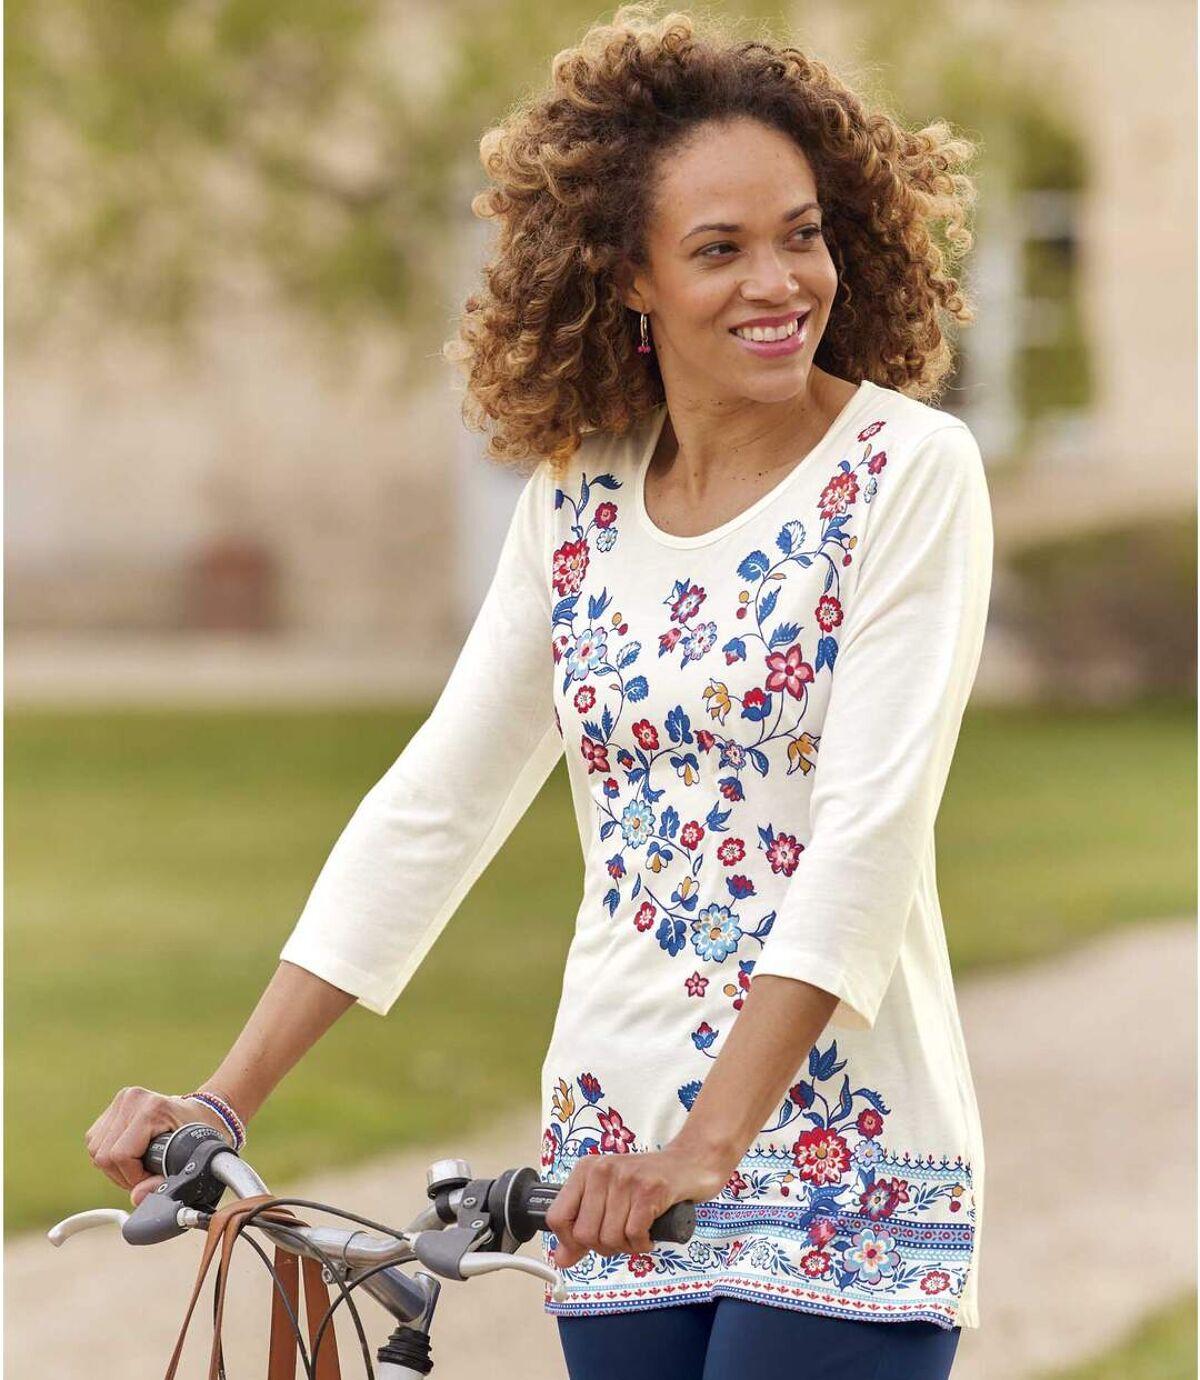 Women's Off-White Floral Print Top   Atlas For Men